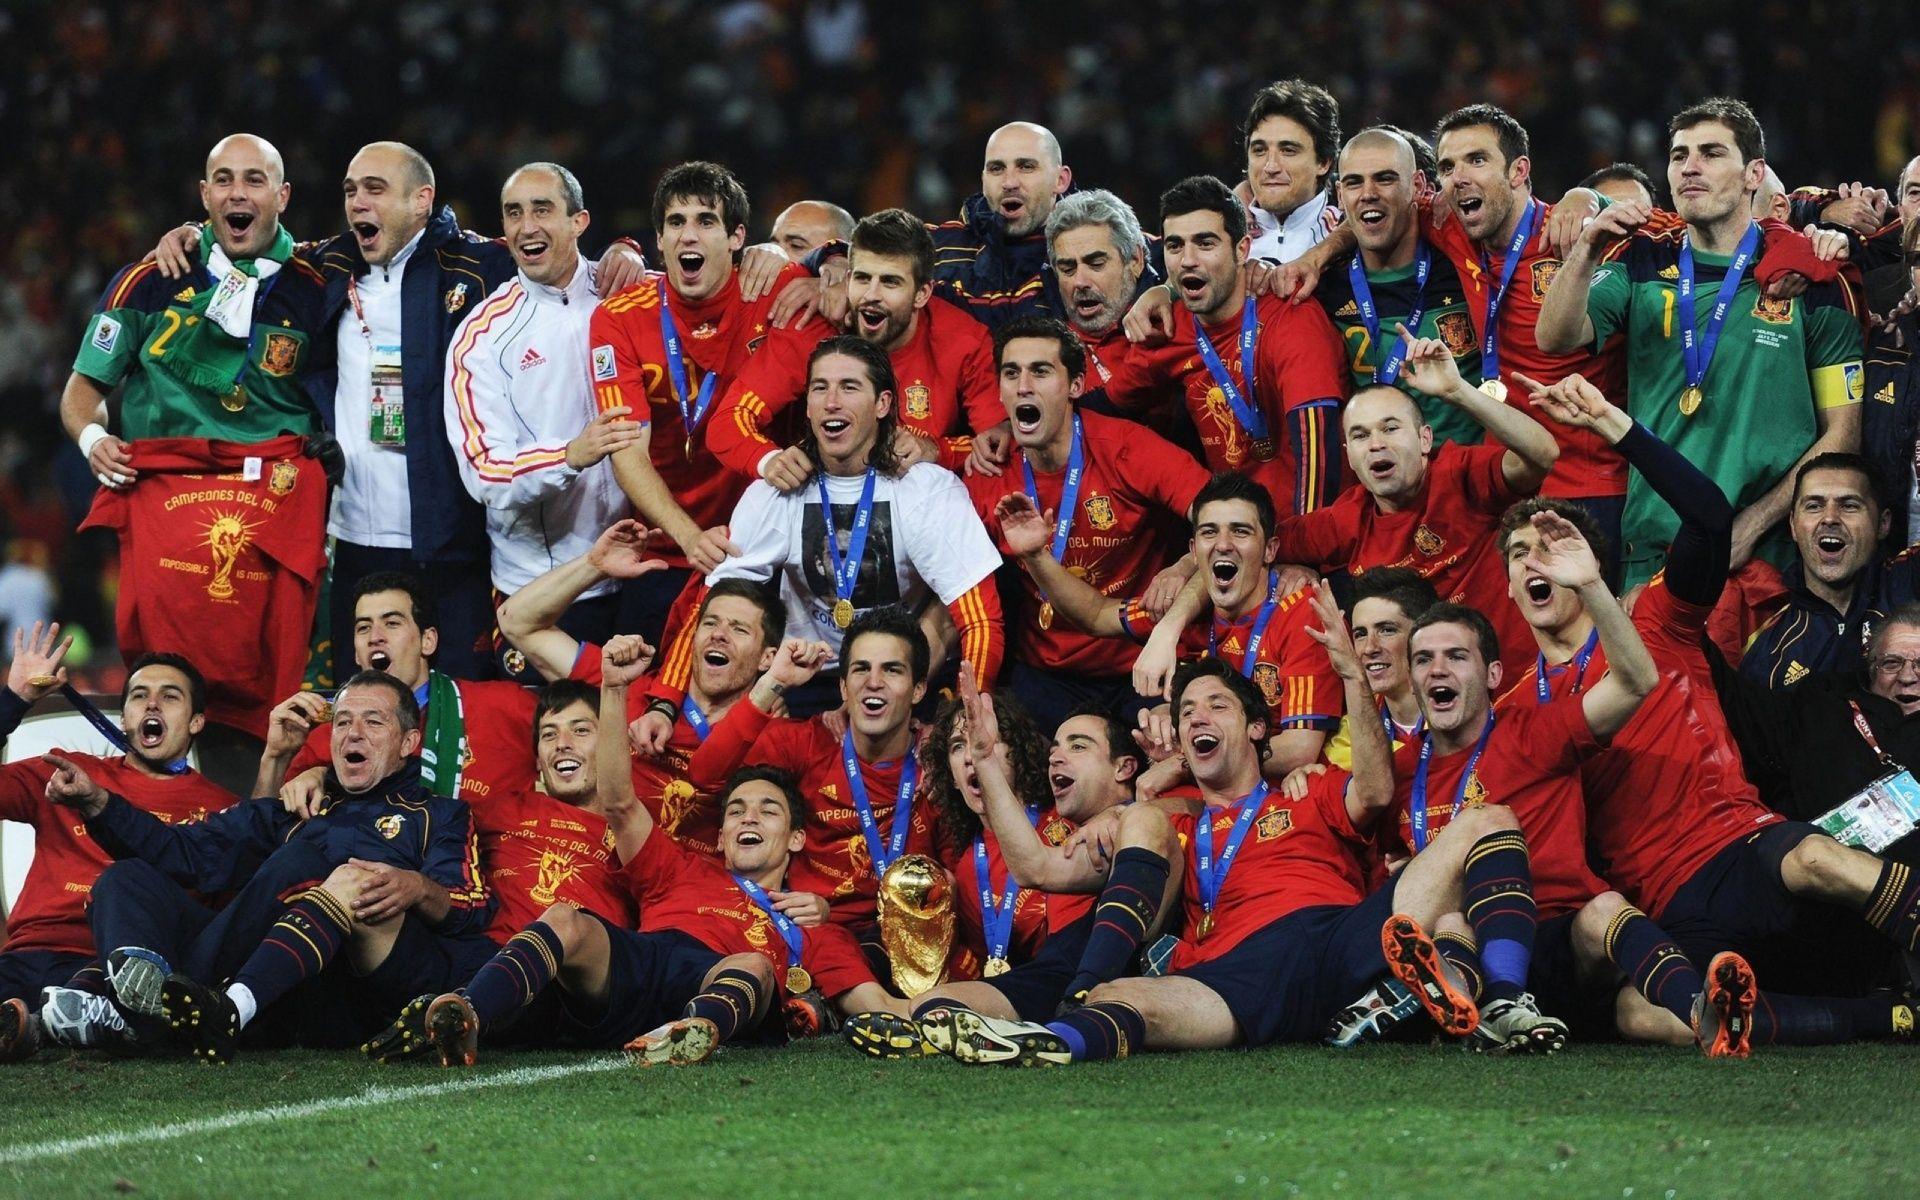 Spain Champion Football Team Wallpaper   Football HD Wallpapers 1920x1200